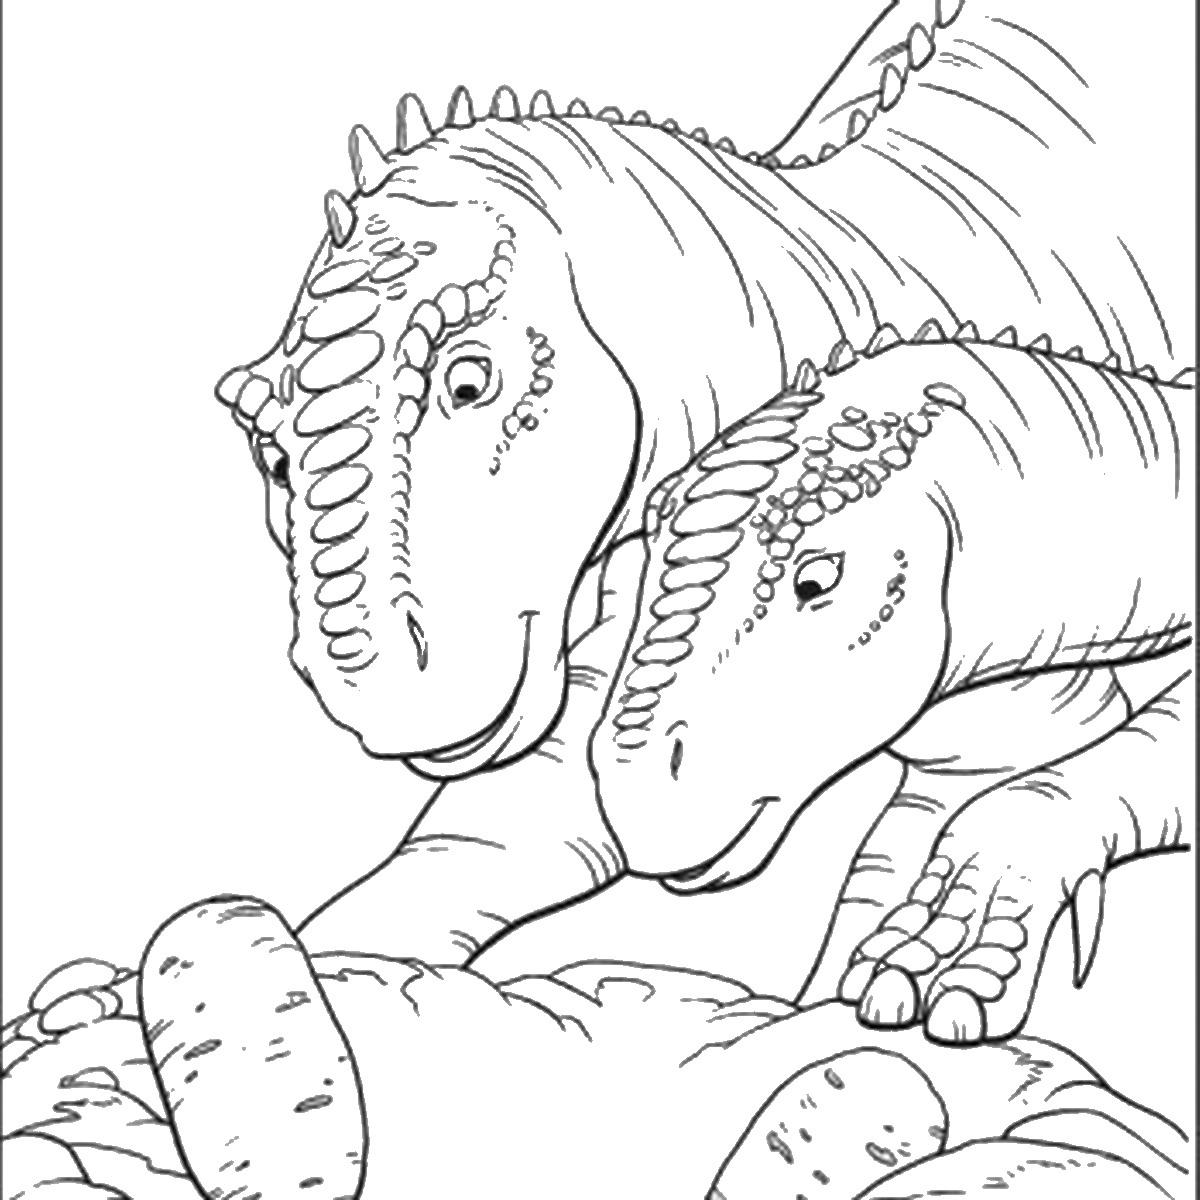 Jurassic Park Colering Pictshers